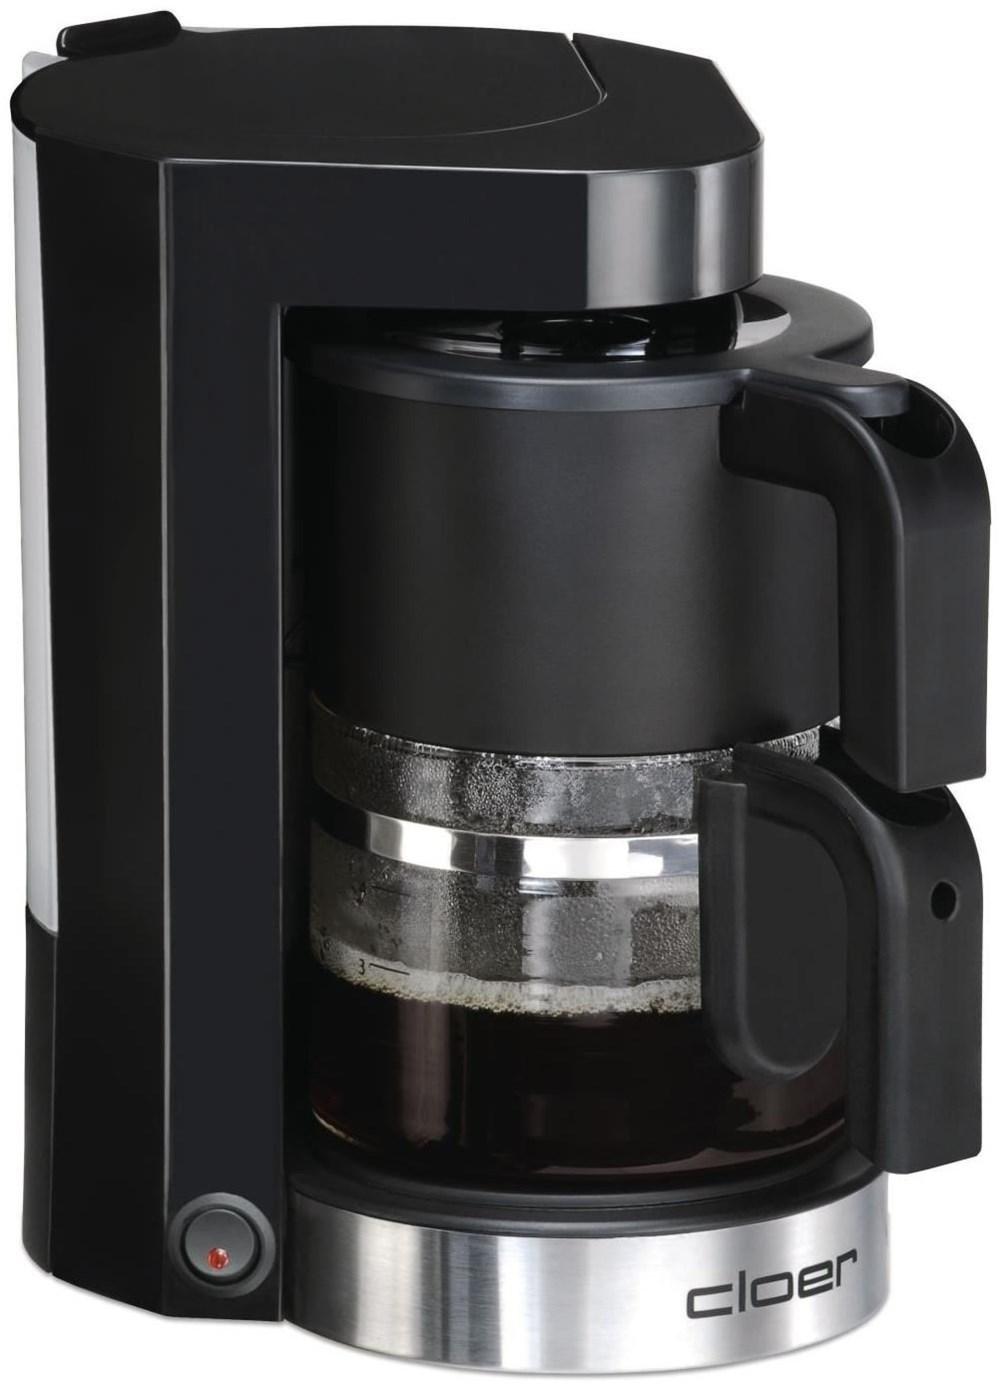 Cloer Filterkaffee-Automat 5990 - Preisvergleich